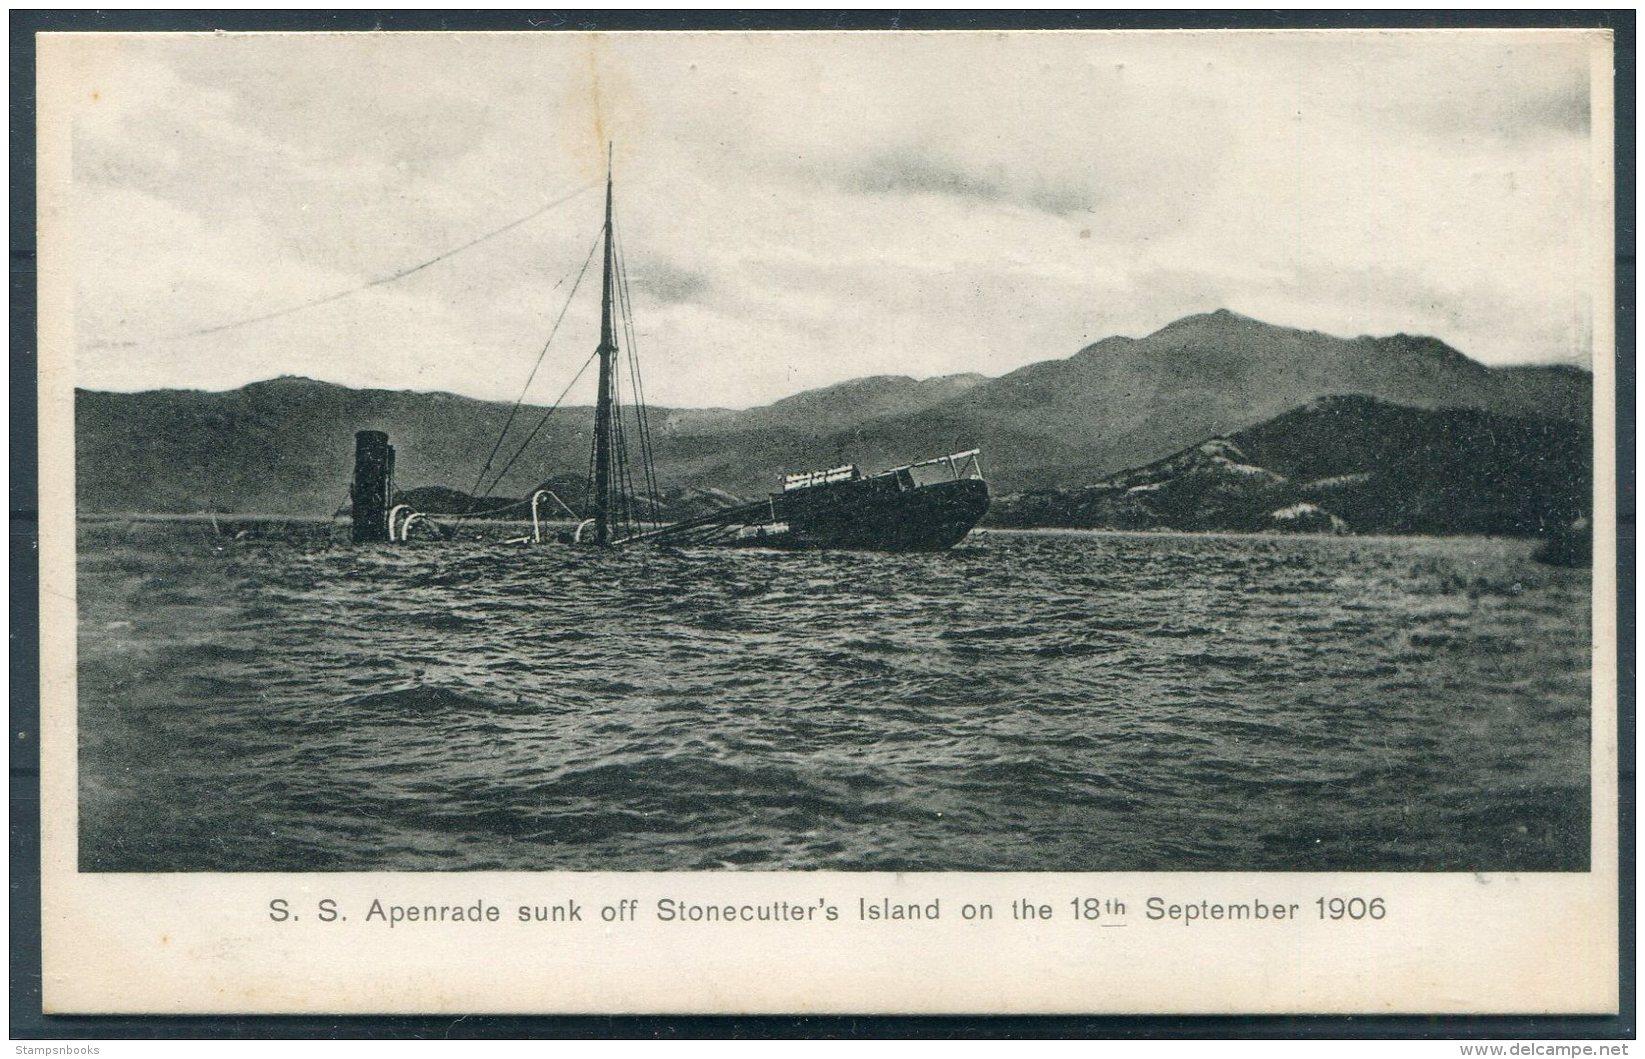 Hong Kong S.S. Apenrade Sunk Off Stonecutters Island 18th September 1906 Sternberg Postcard - China (Hong Kong)